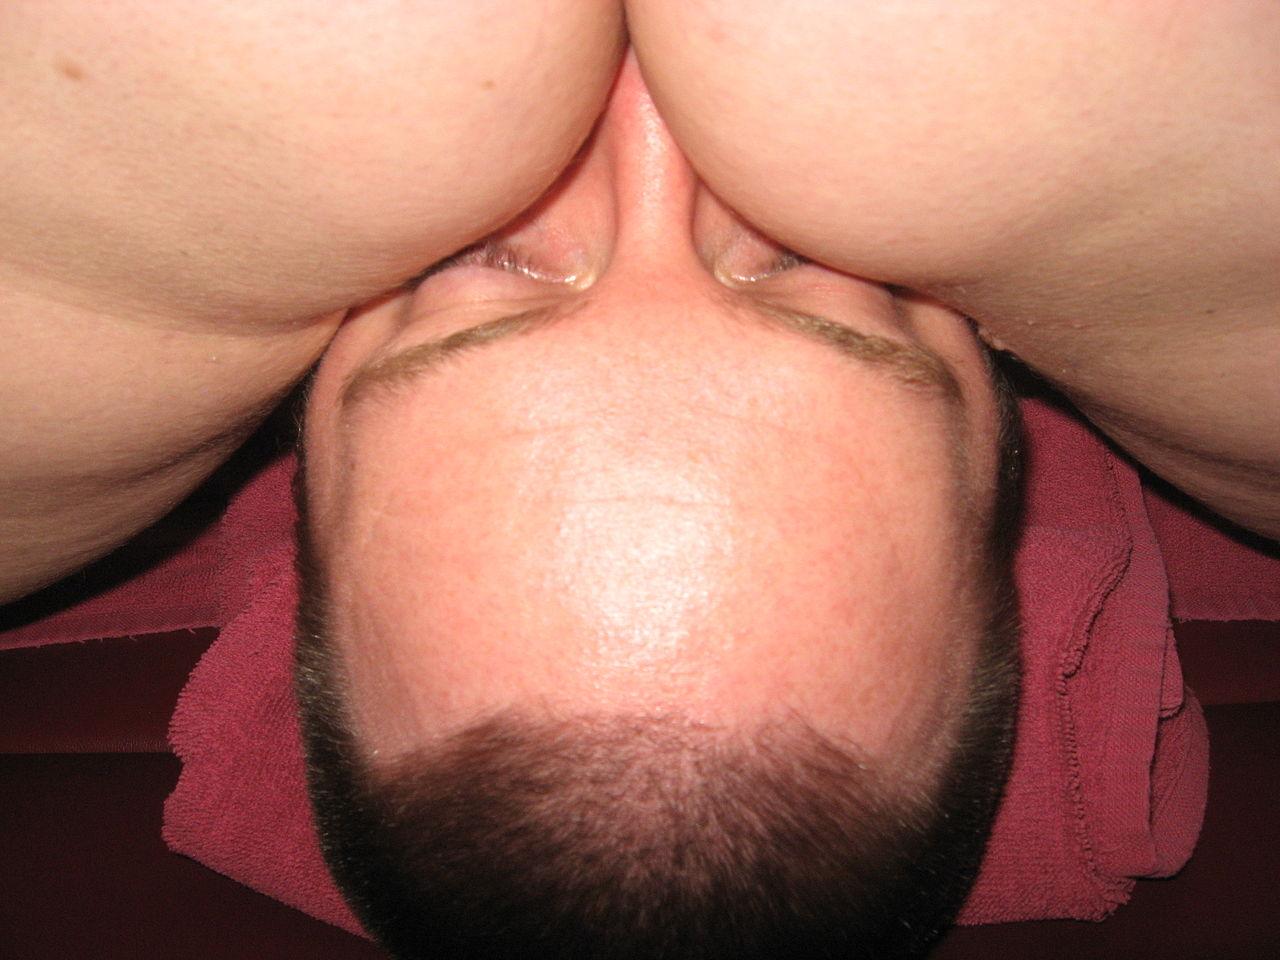 anilingus porn